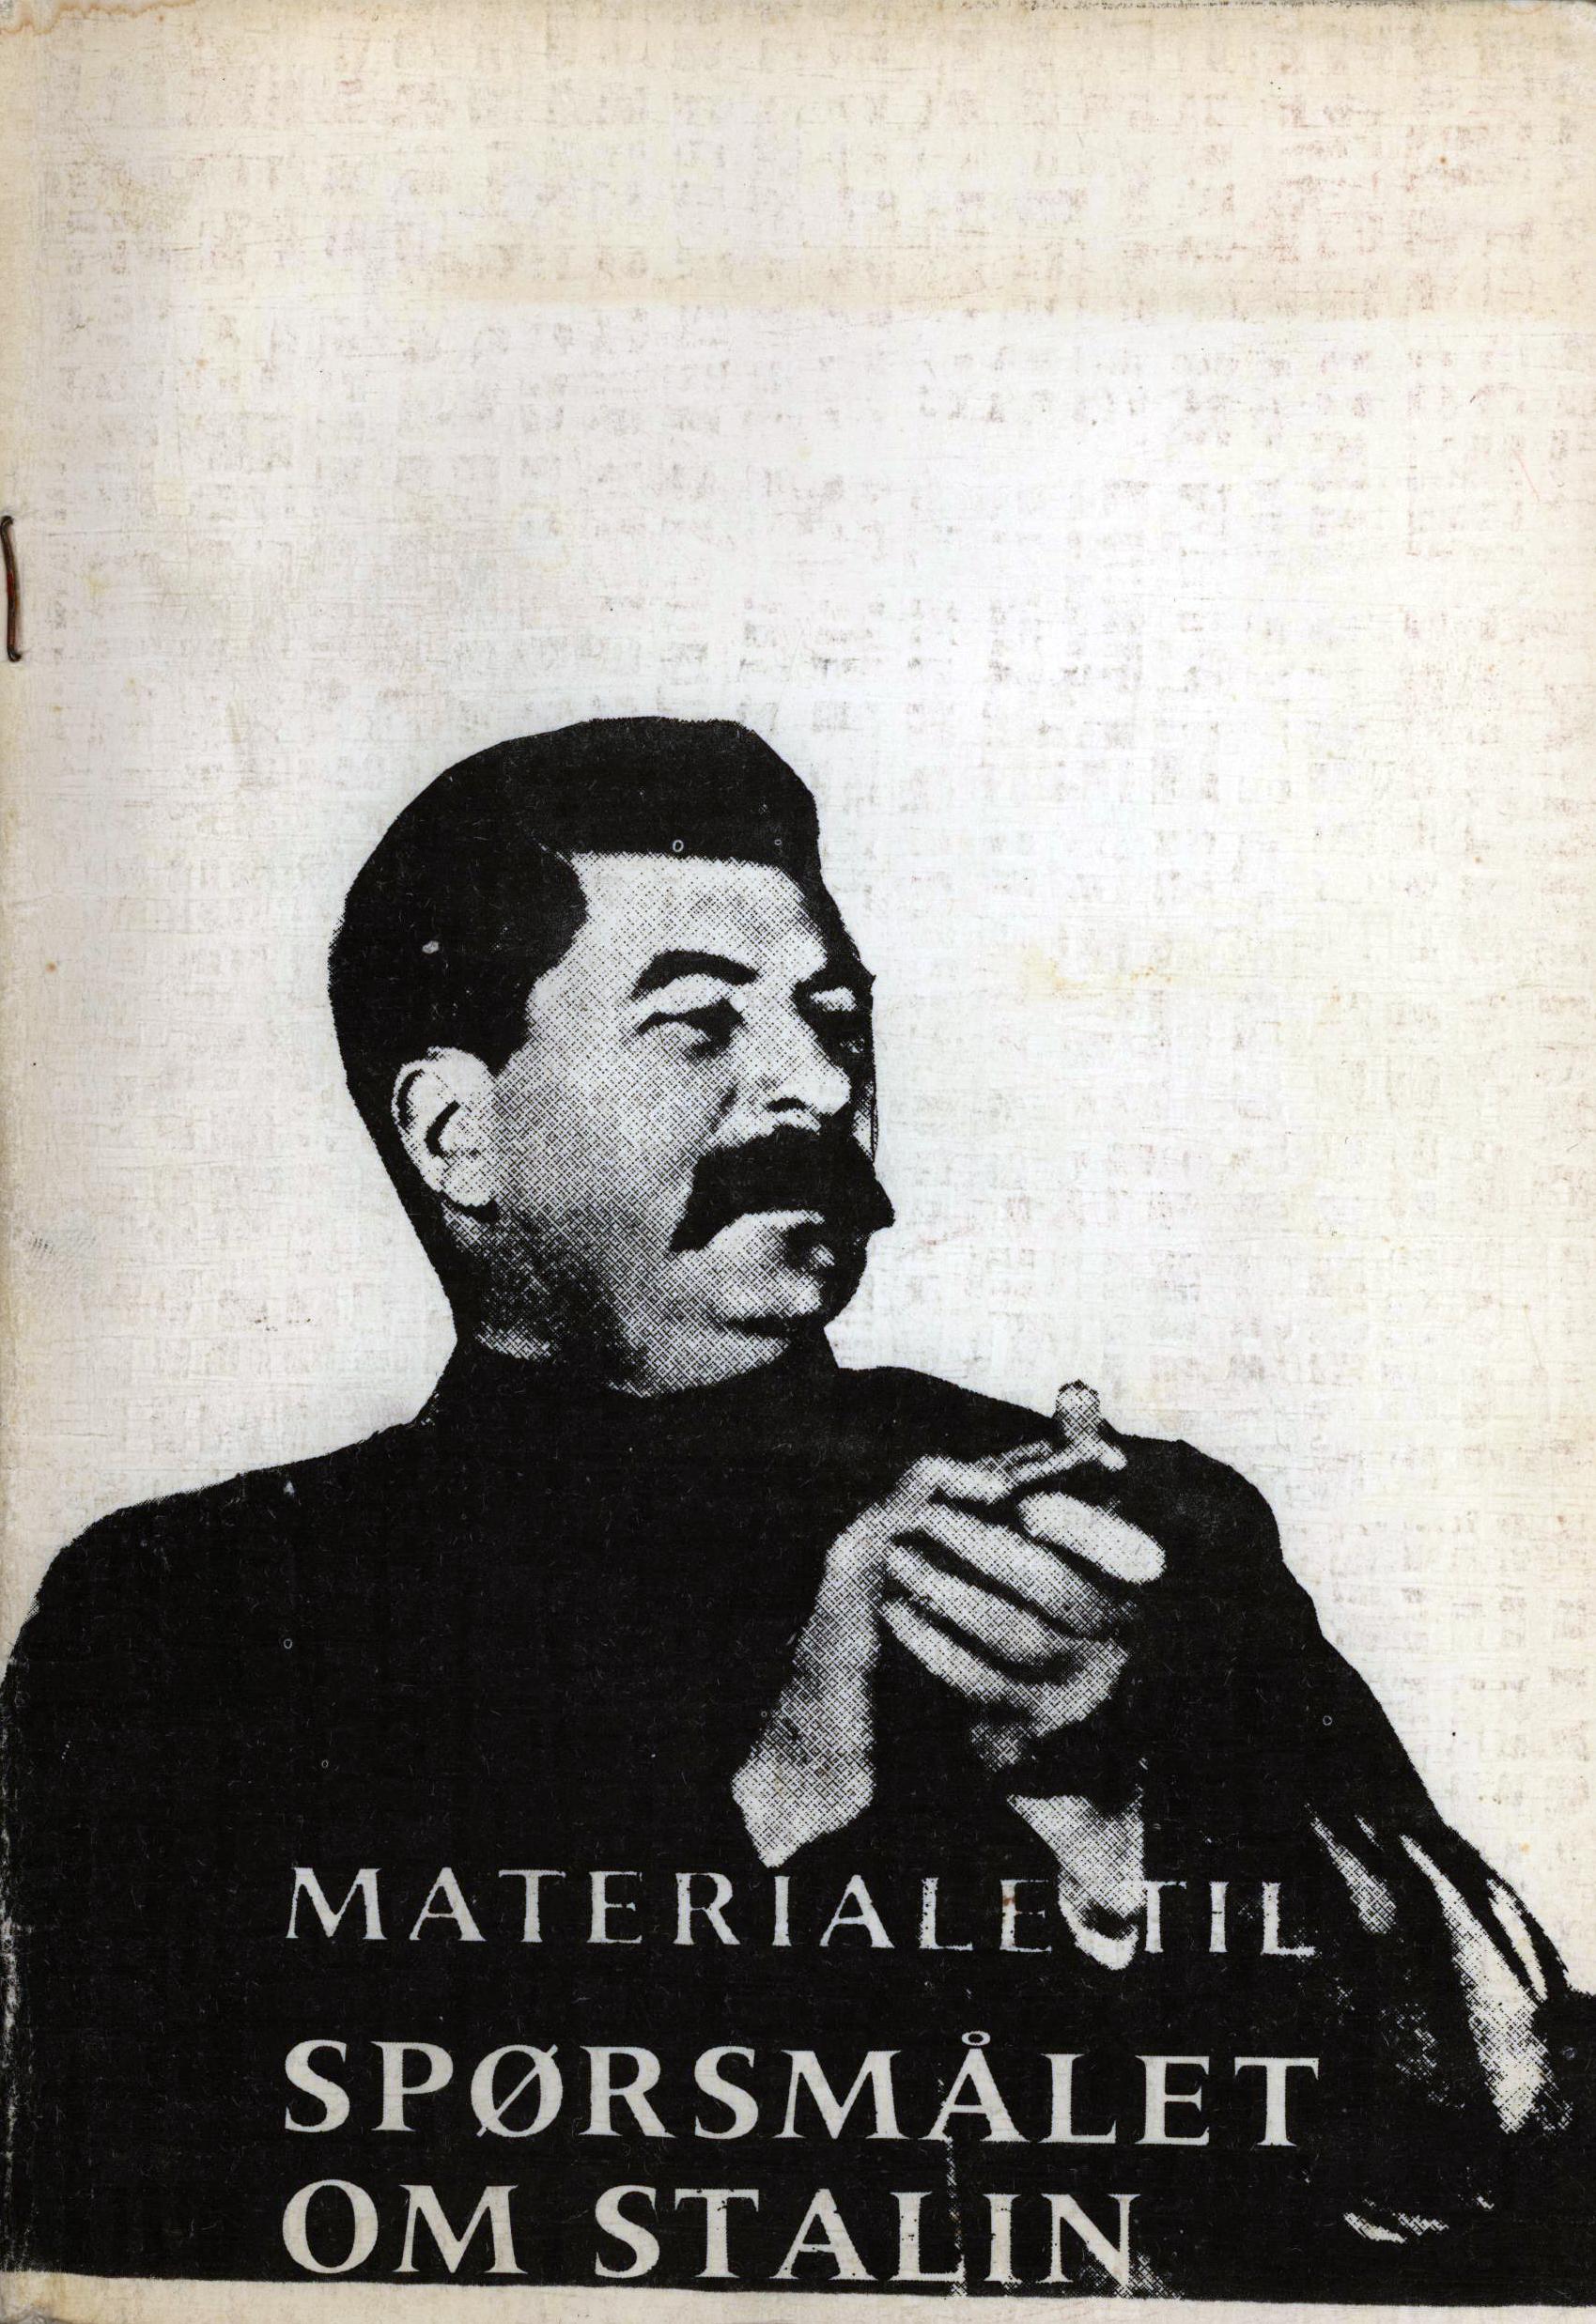 Materiale til spørsmålet om Stalin